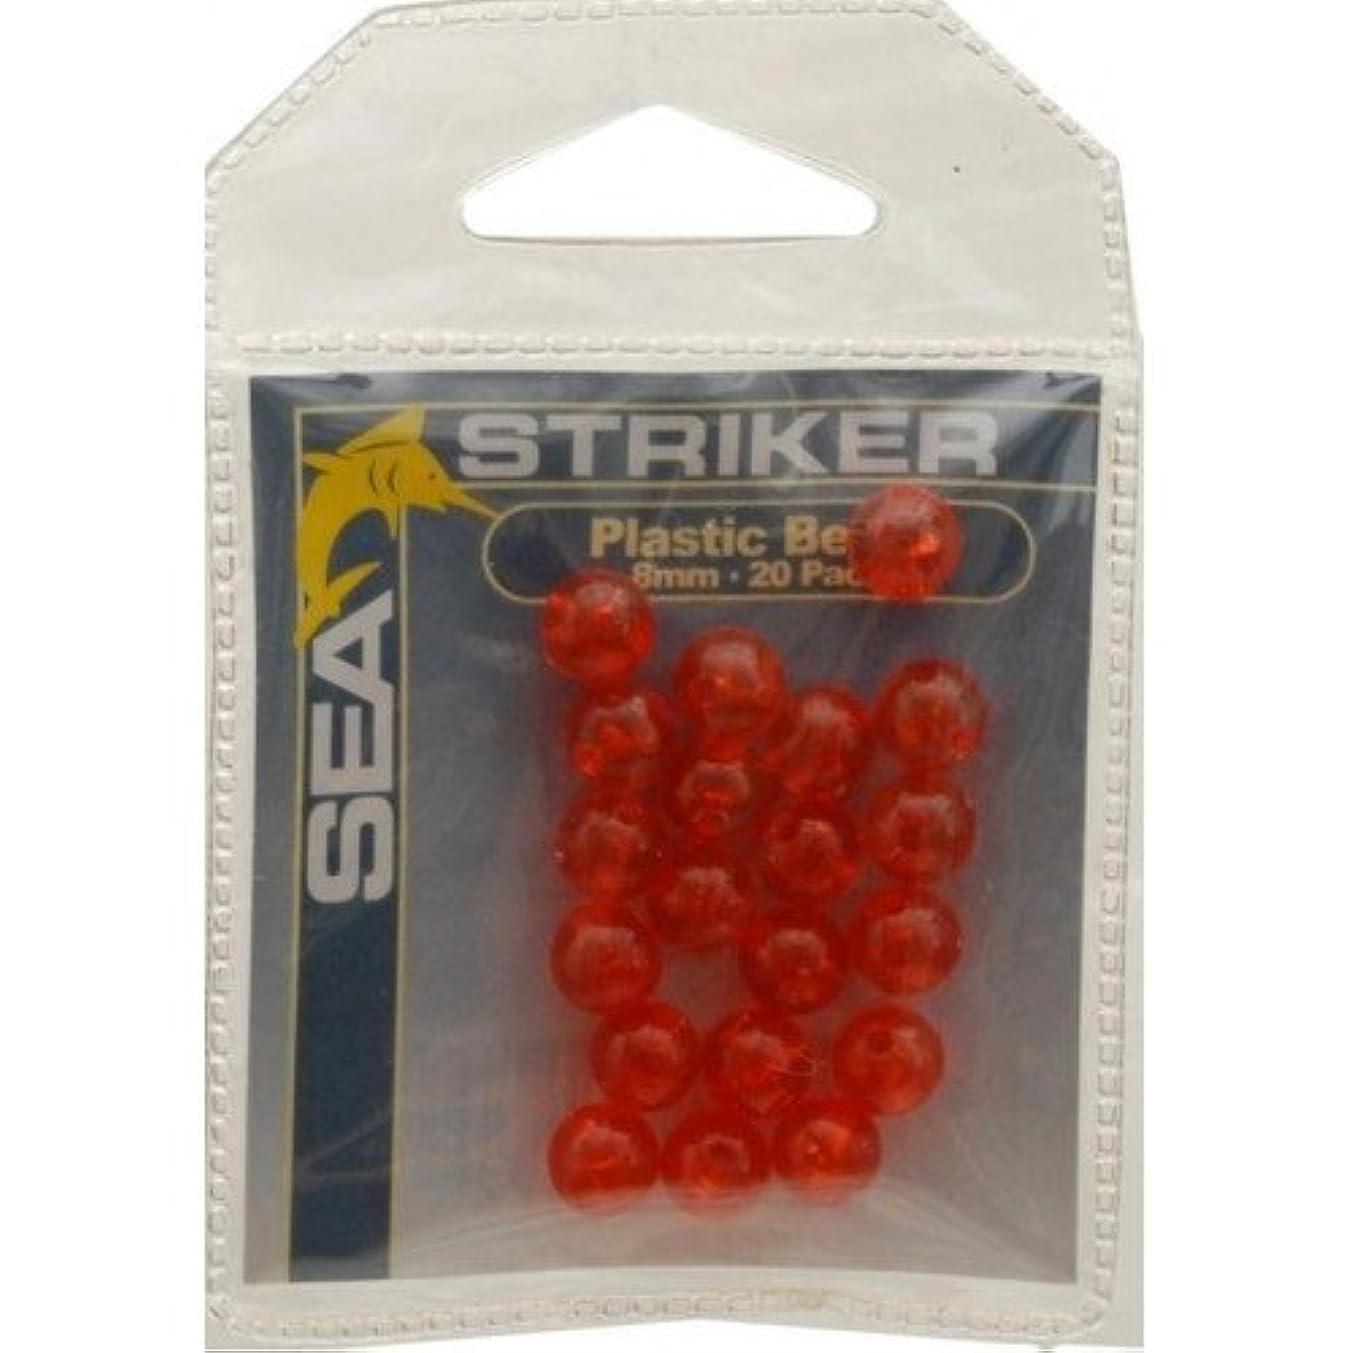 Sea Striker Plastic Beads 6MM - Red